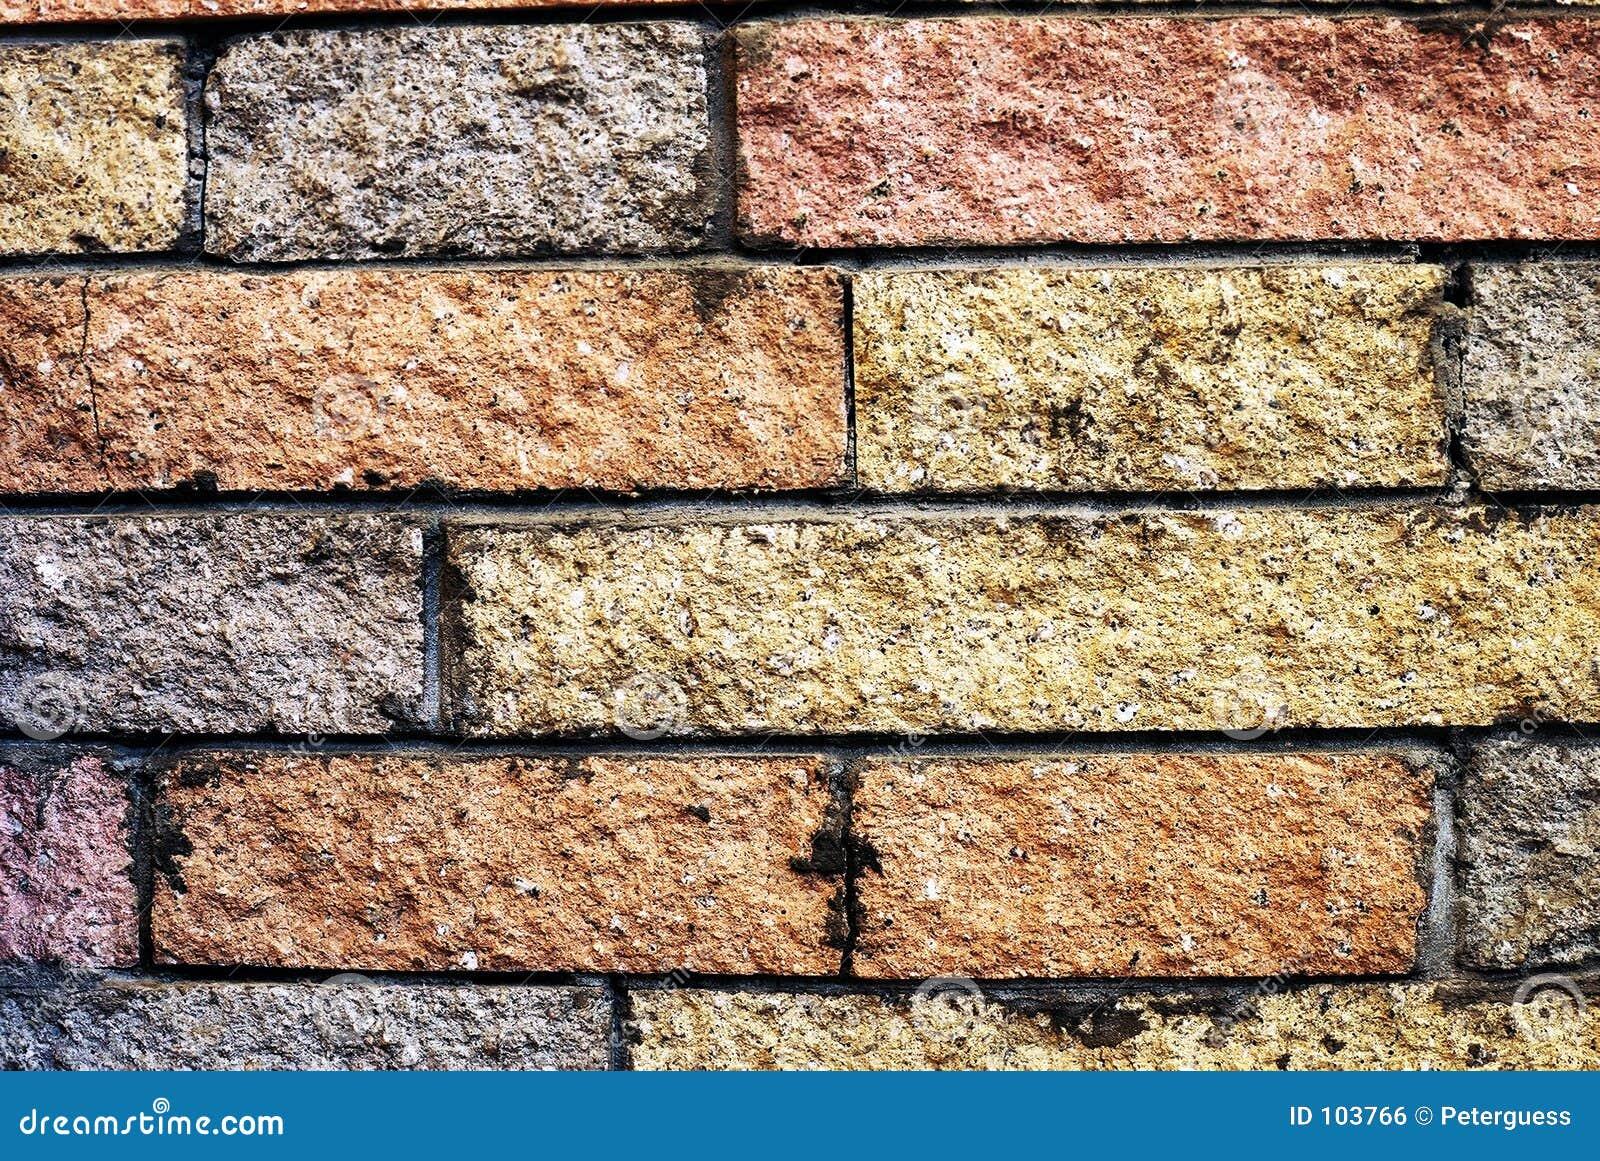 Decorative Brick Wall (70s Hearth) Royalty Free Stock Image - Image ...